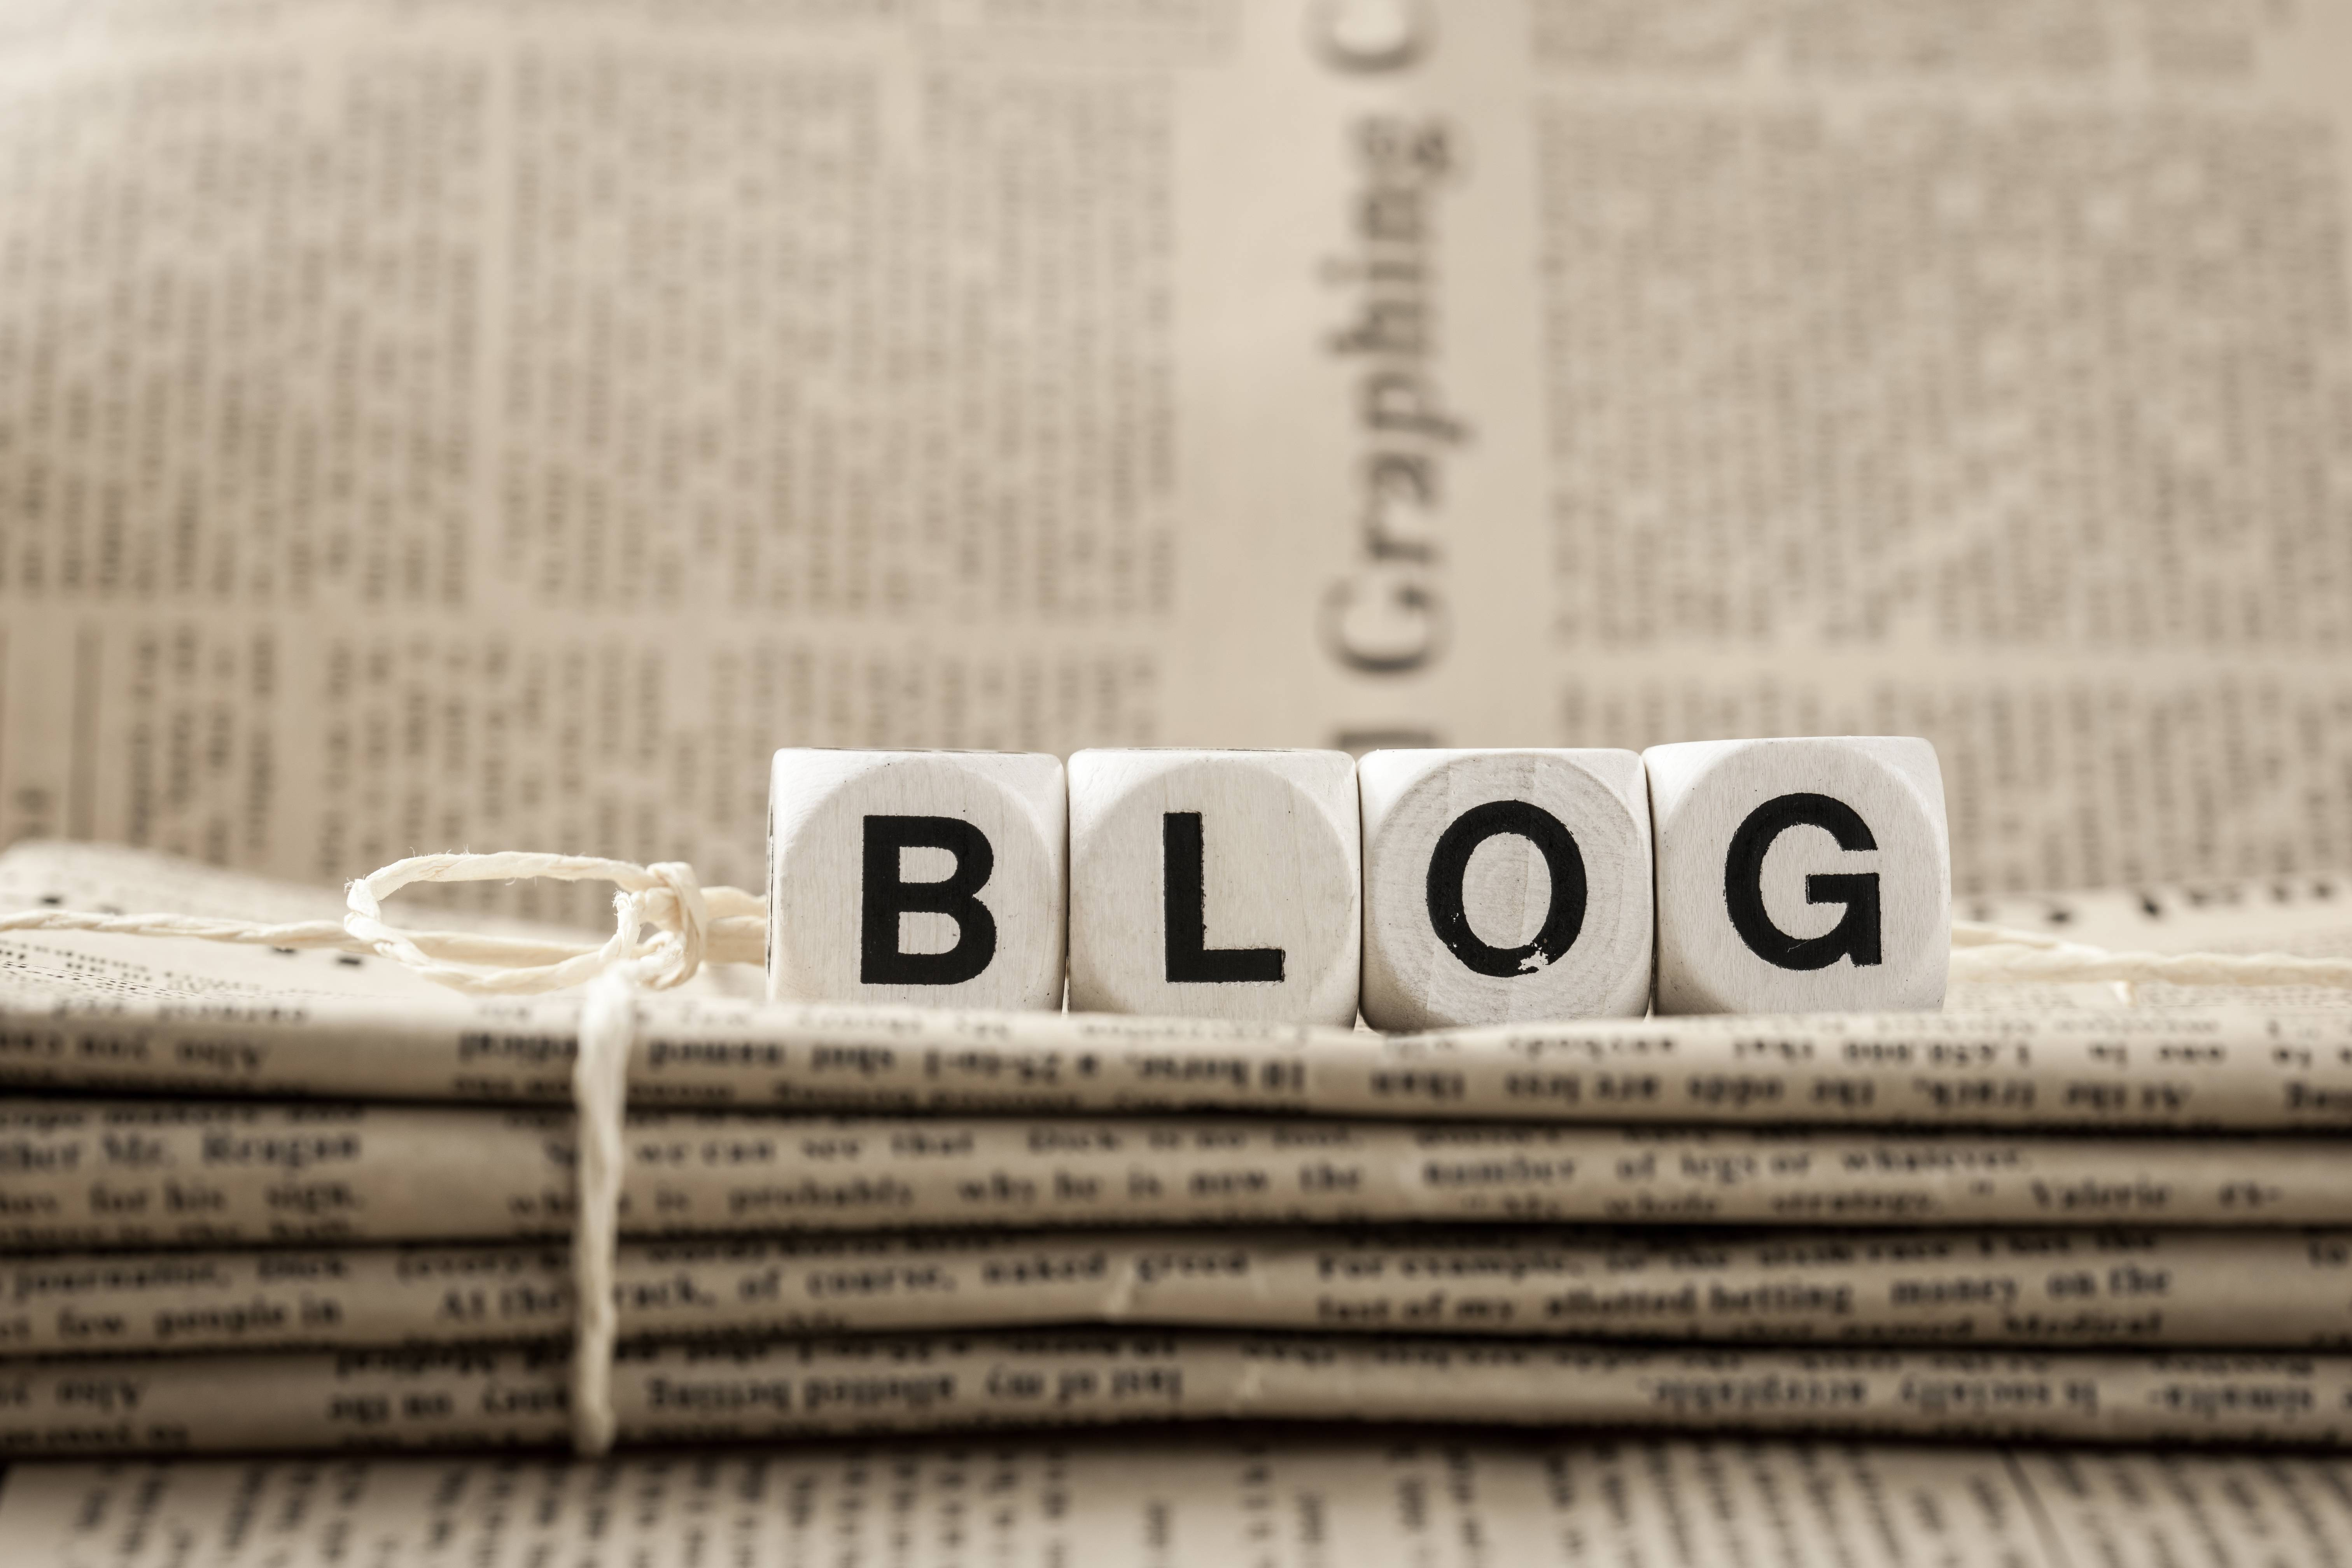 A useful blog